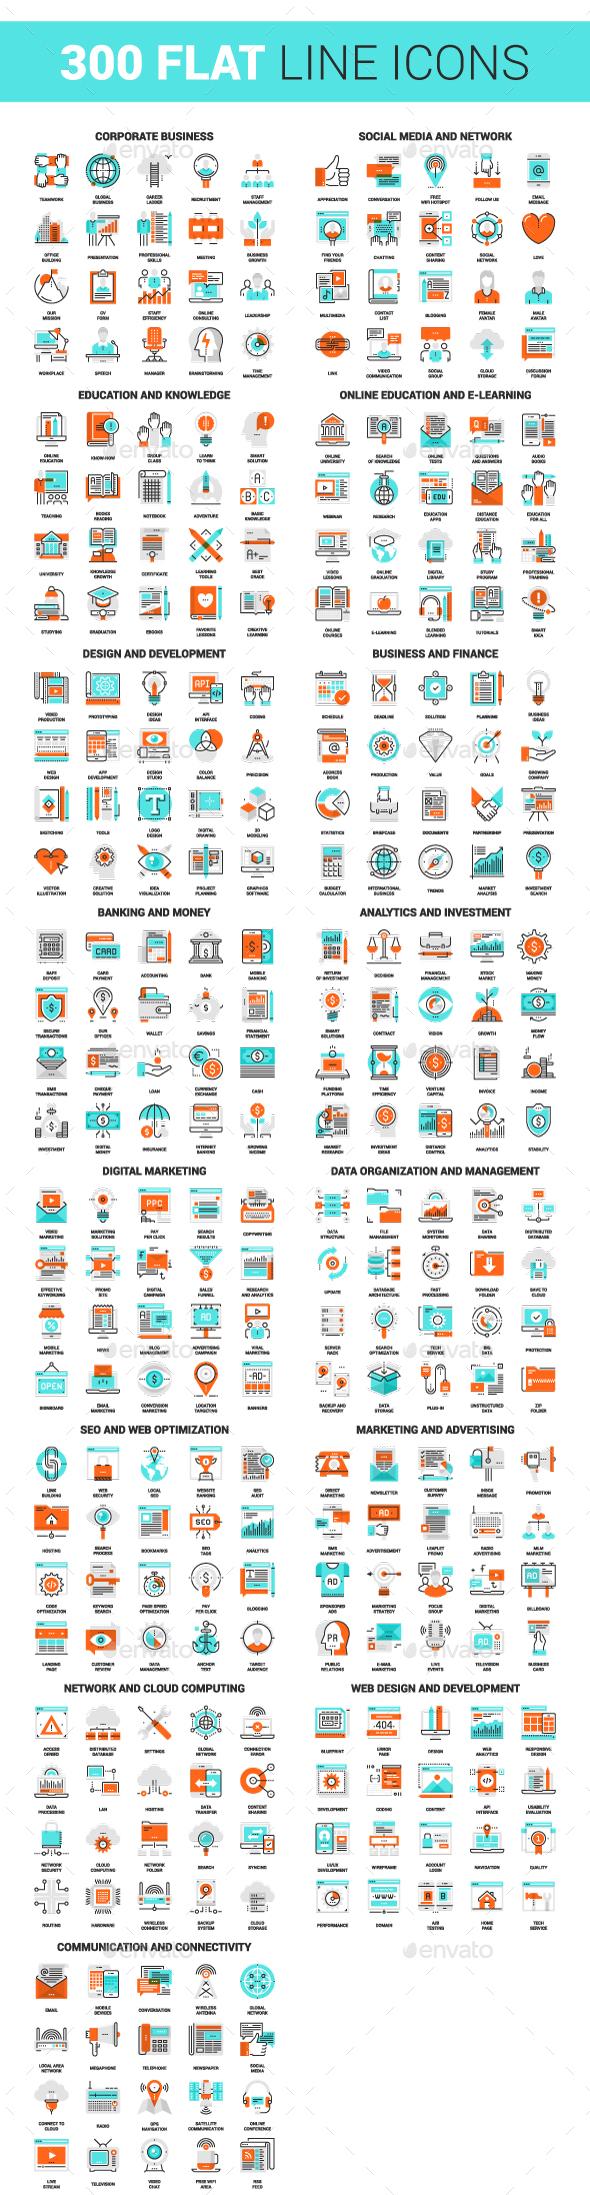 300 Flat Line Icons